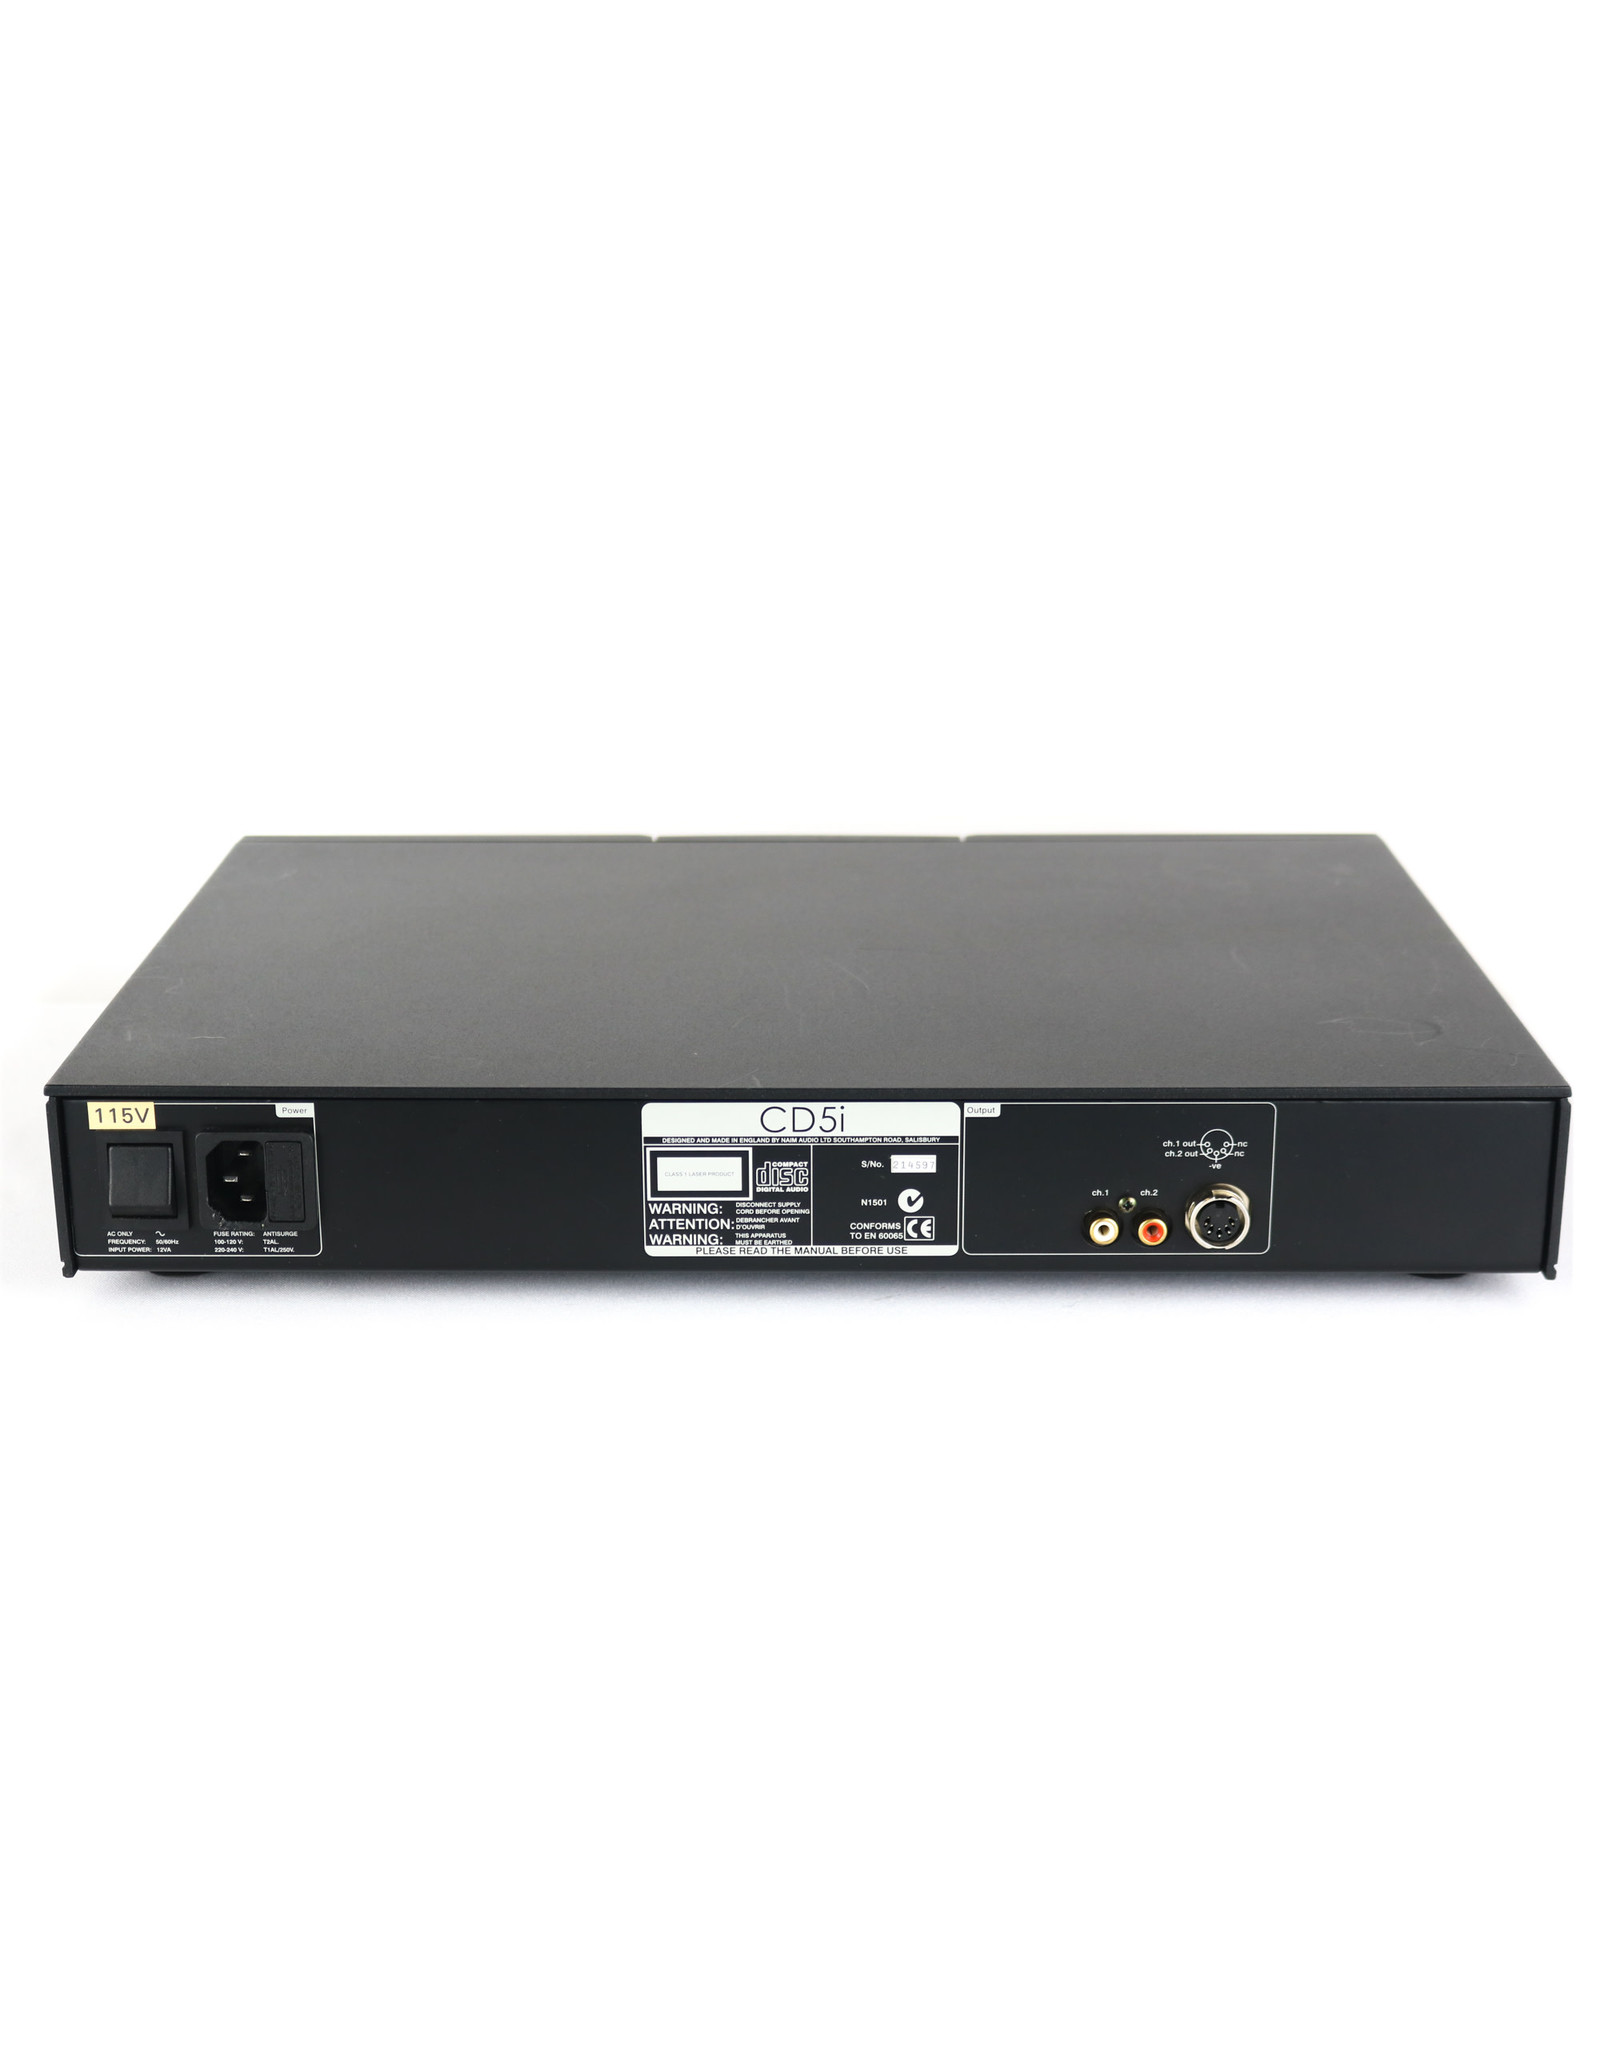 Naim Audio Naim Audio CD5i CD Player USED